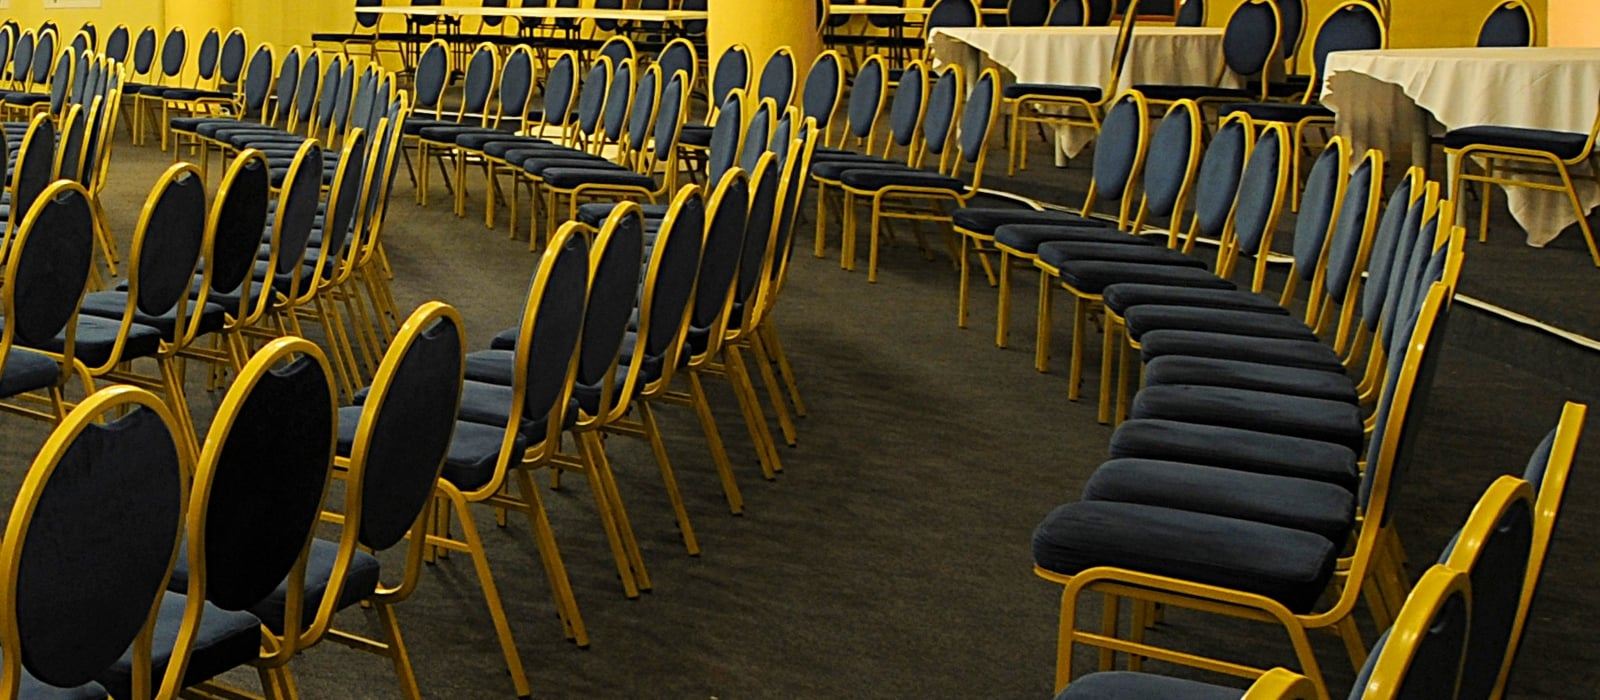 Services Hotel Djerba Resort - Vincci Hotels - Conference Rooms